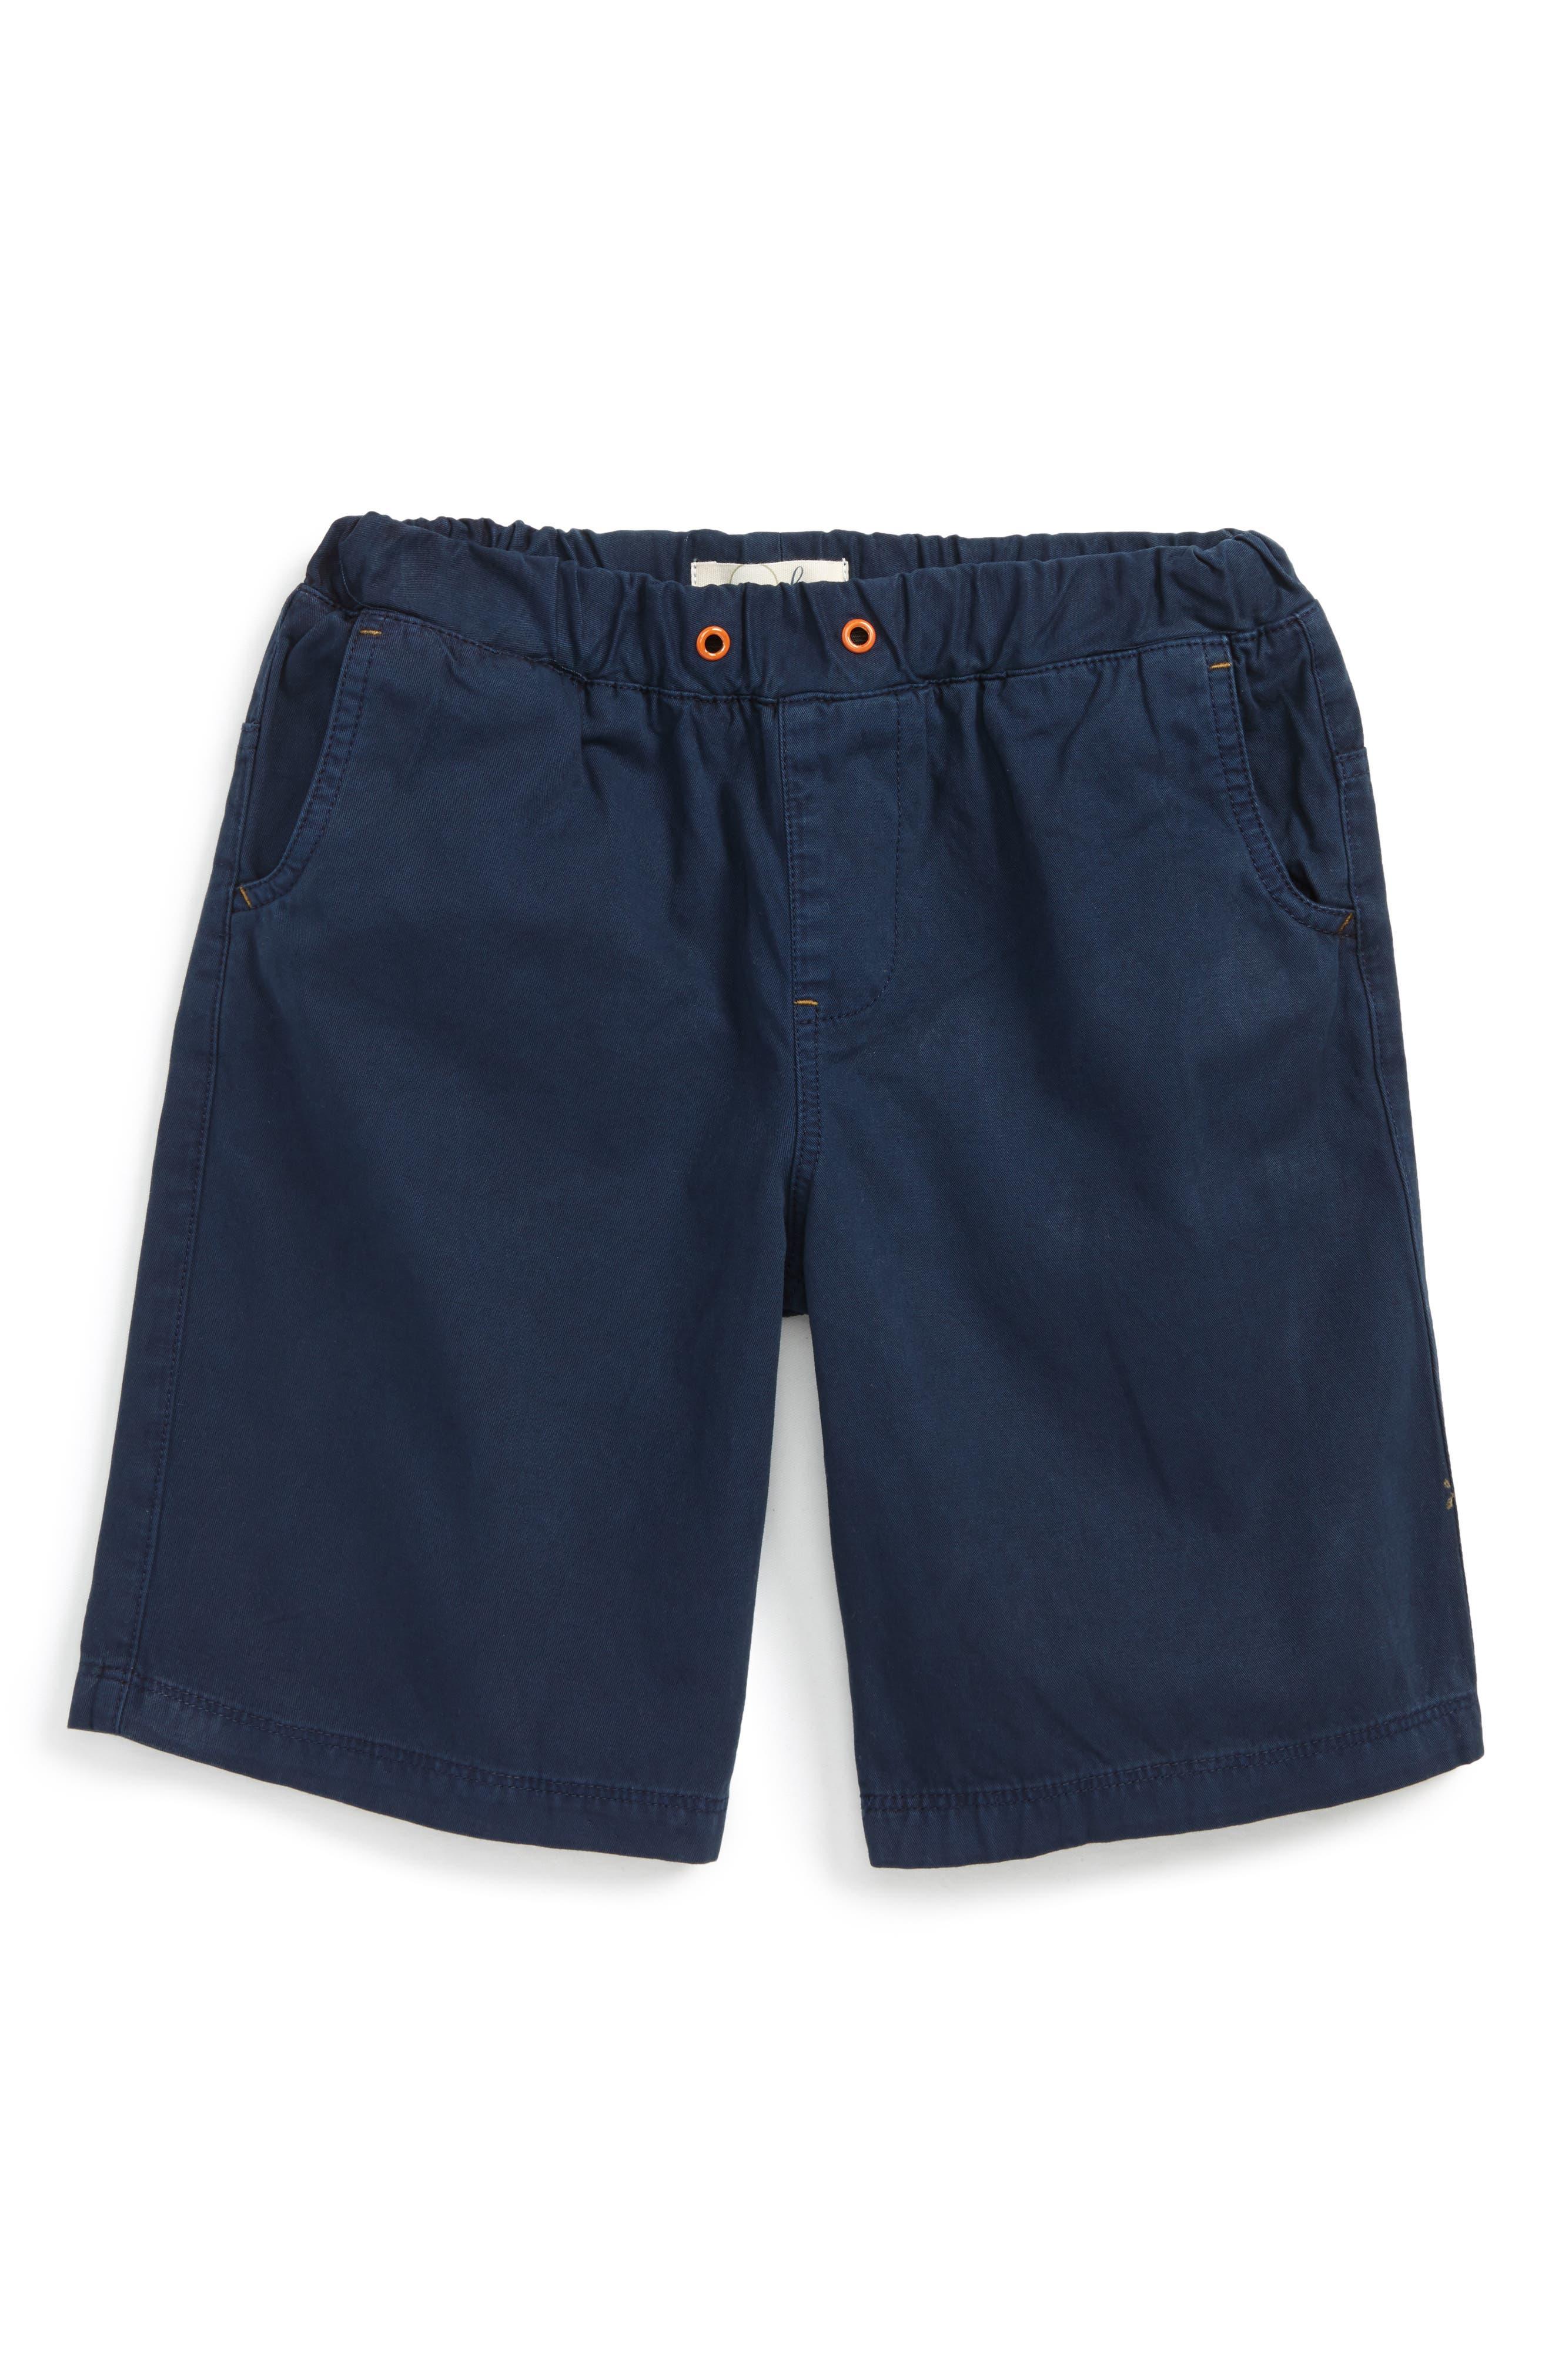 Peek Morgan Shorts (Toddler Boys, Little Boys & Big Boys)